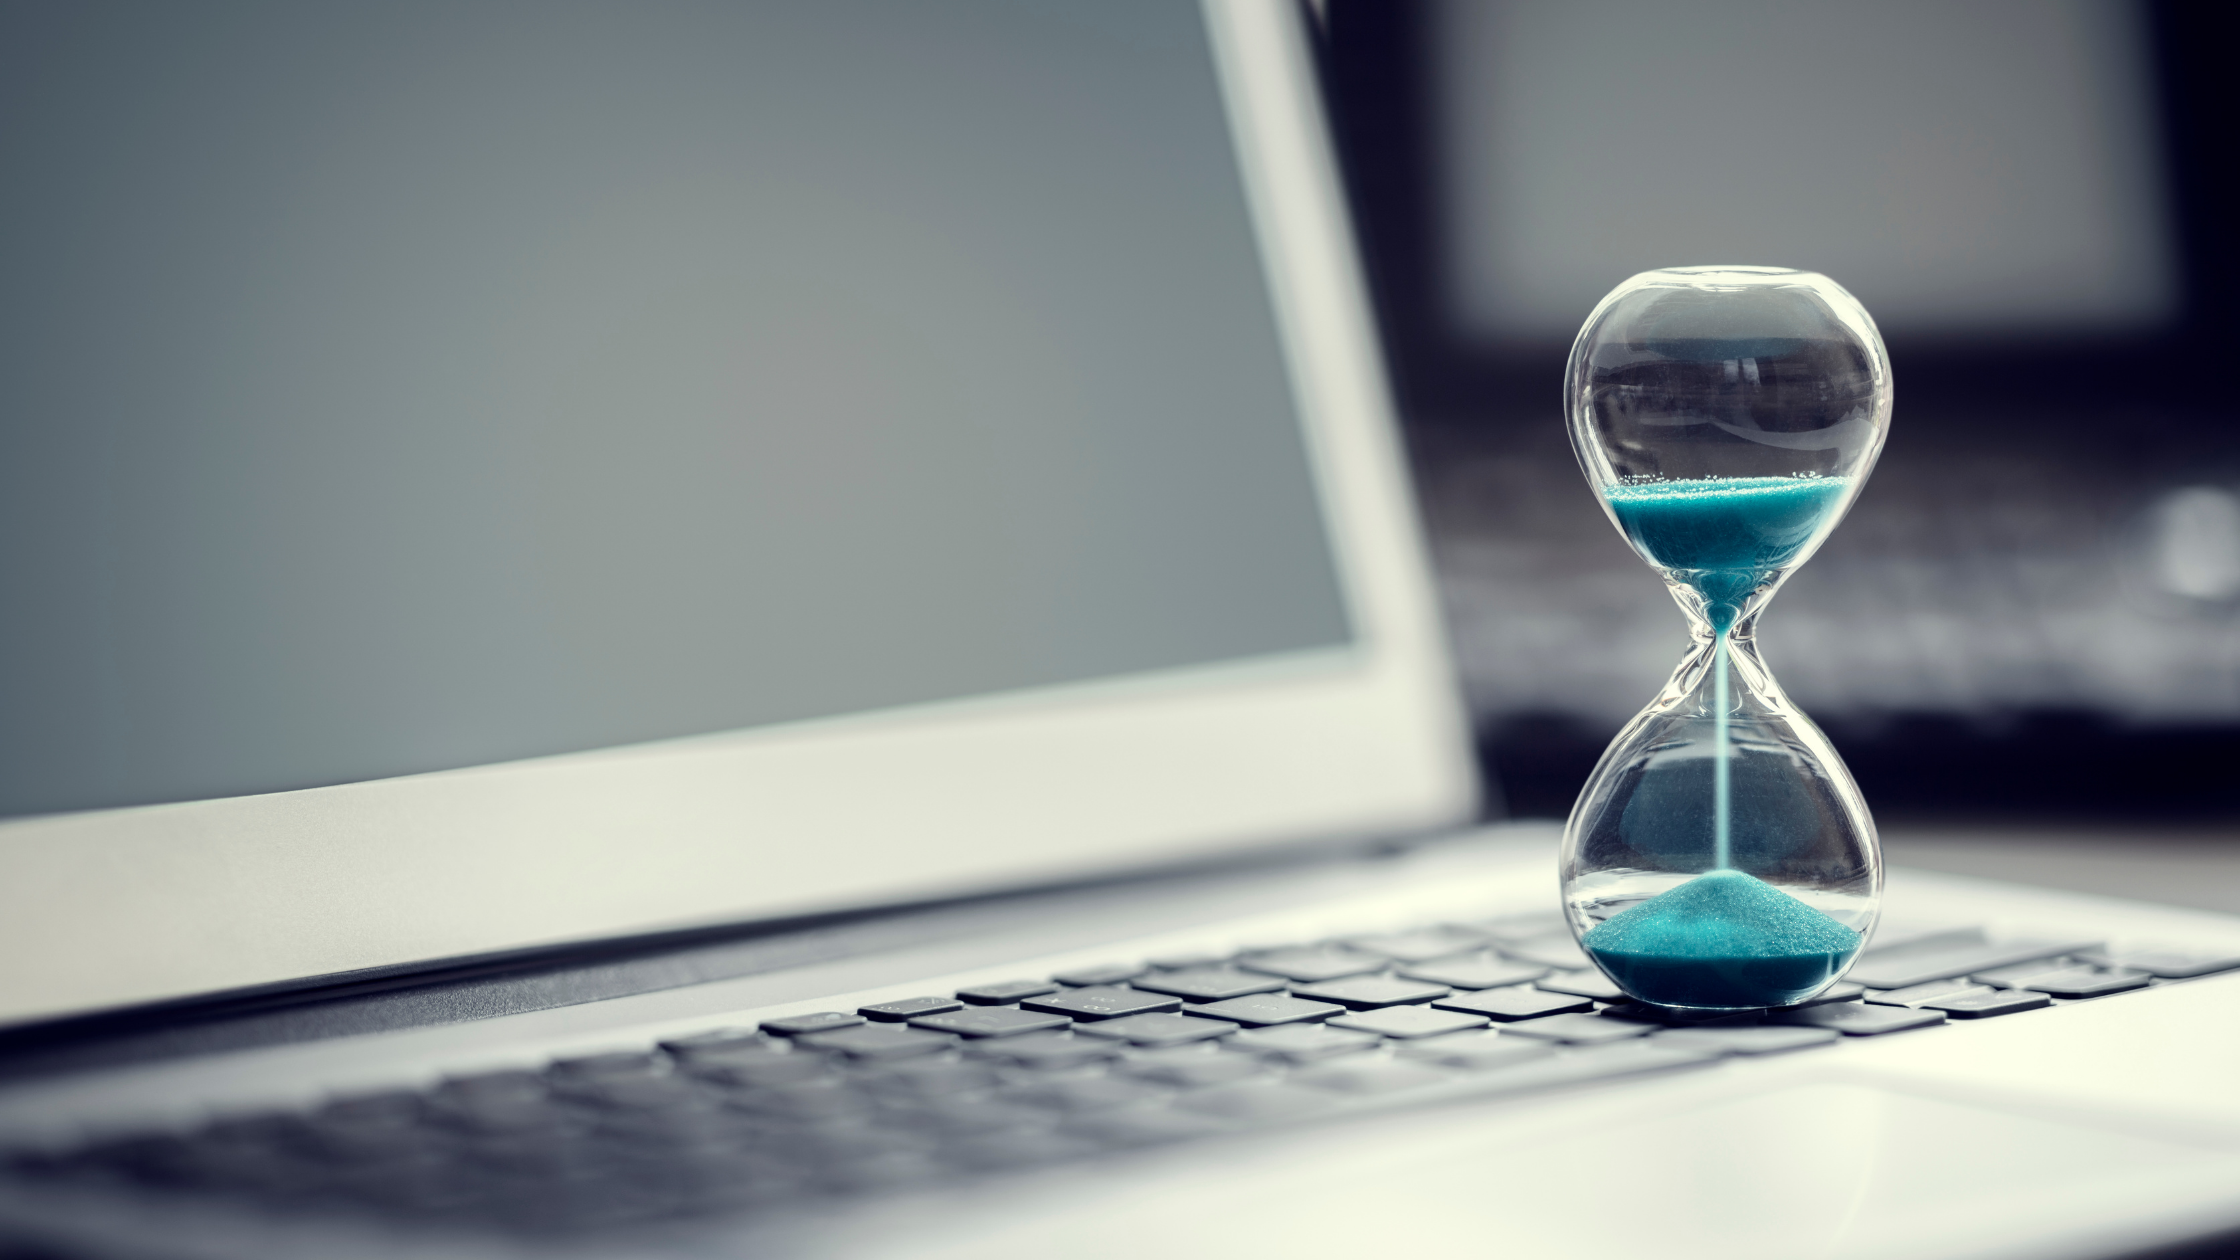 Deadlines keeping you awake